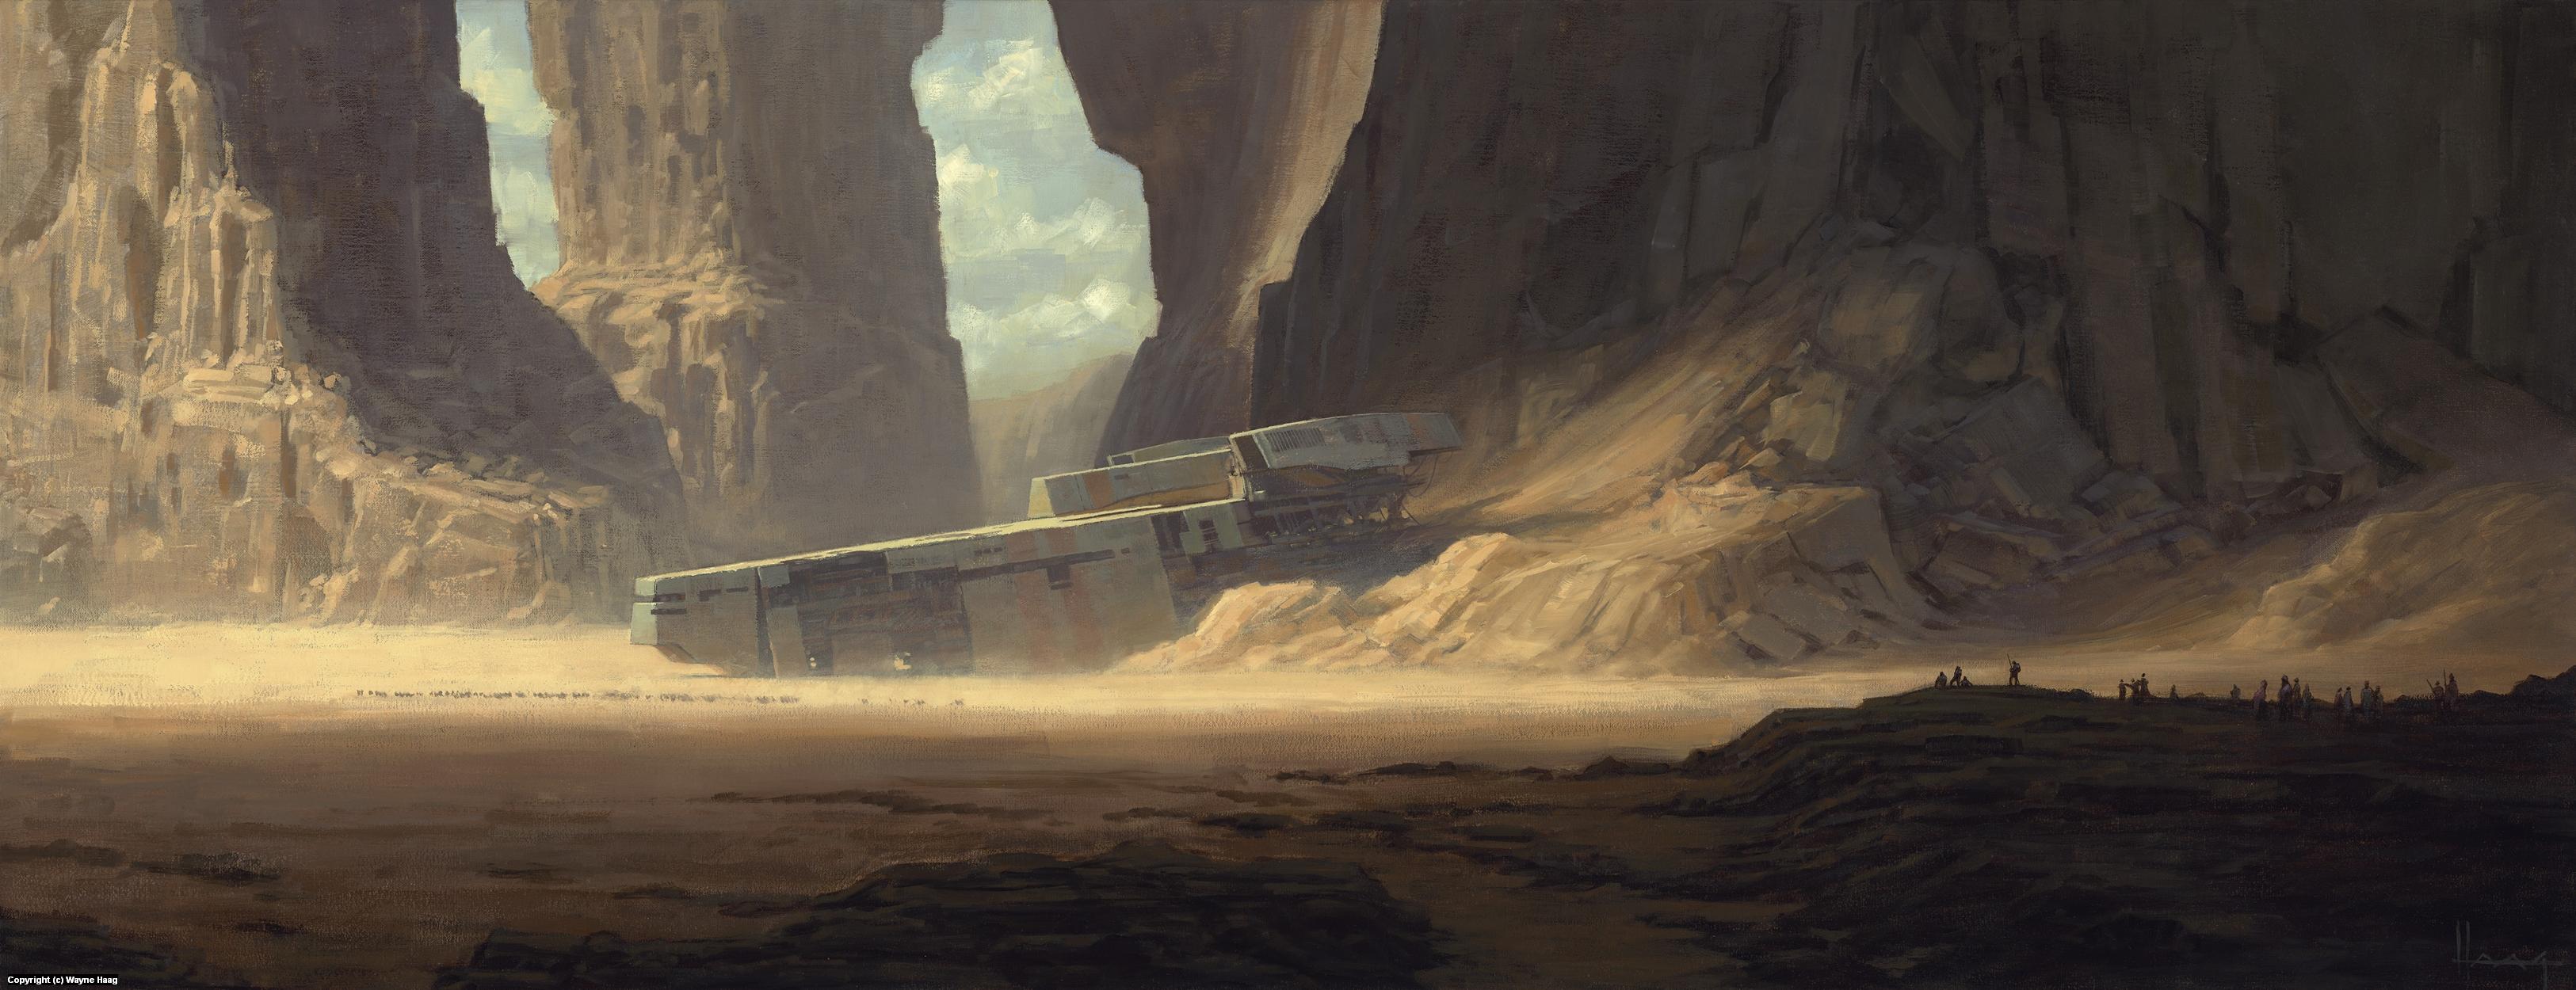 Desert Wreck Artwork by Wayne Haag